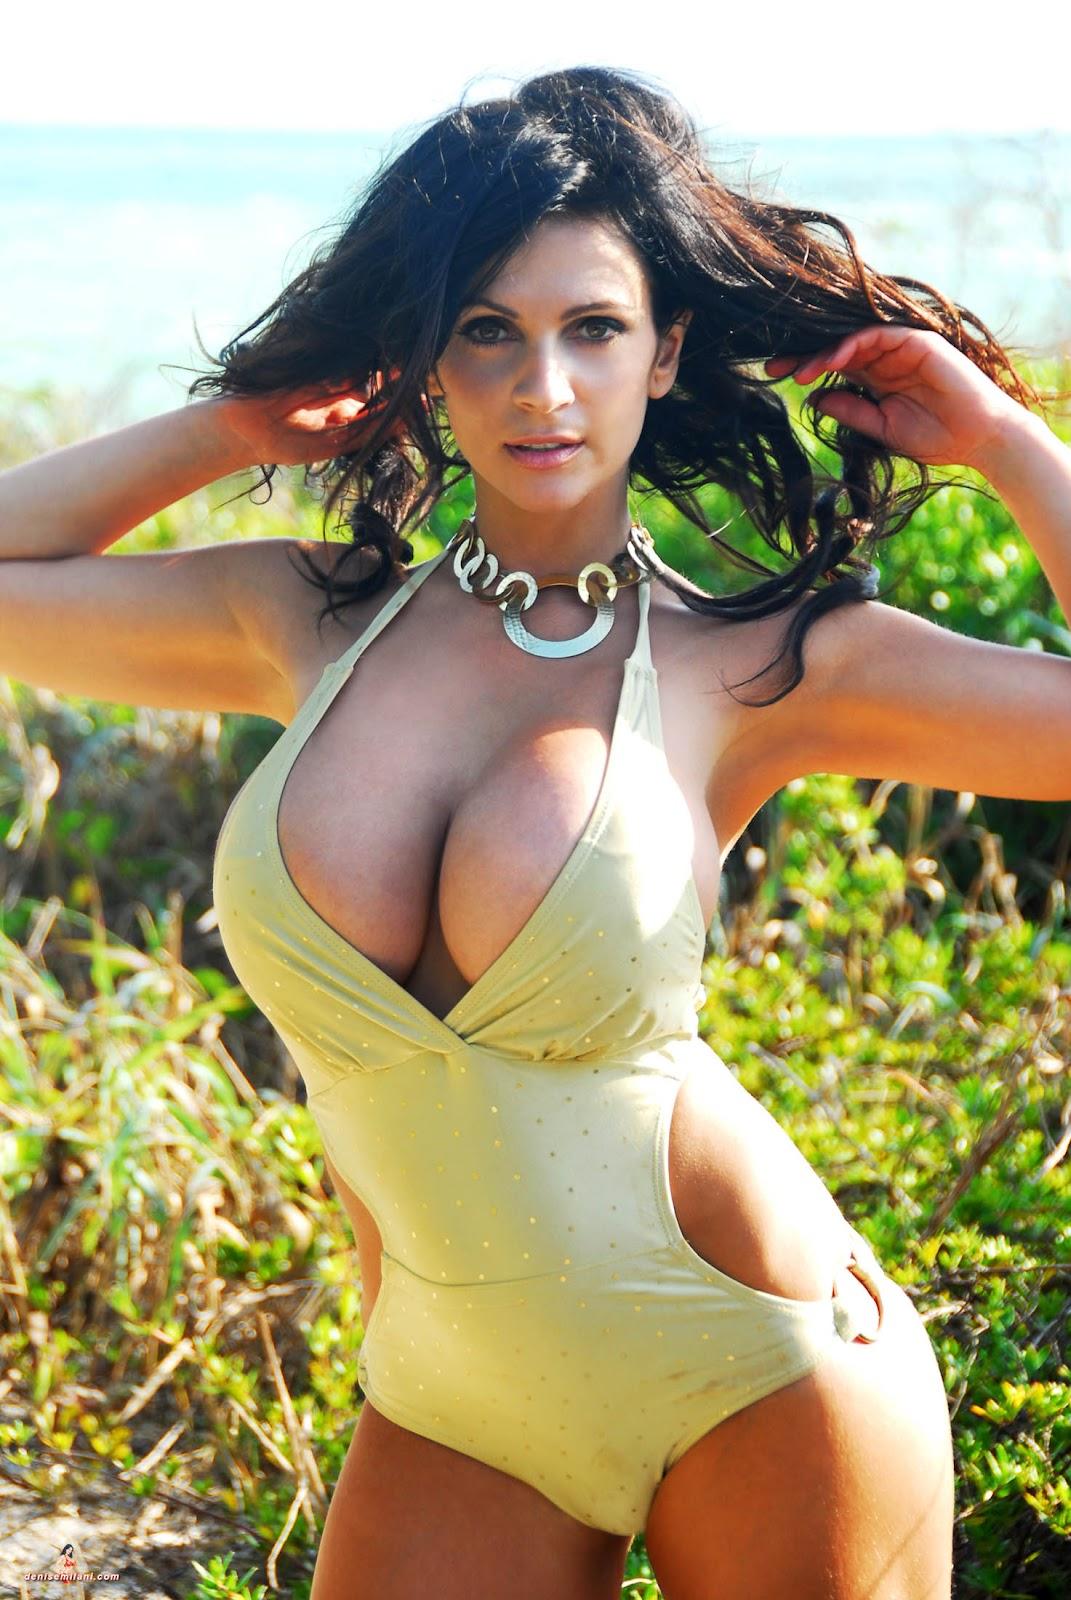 image Denise milani fitness pro non nude